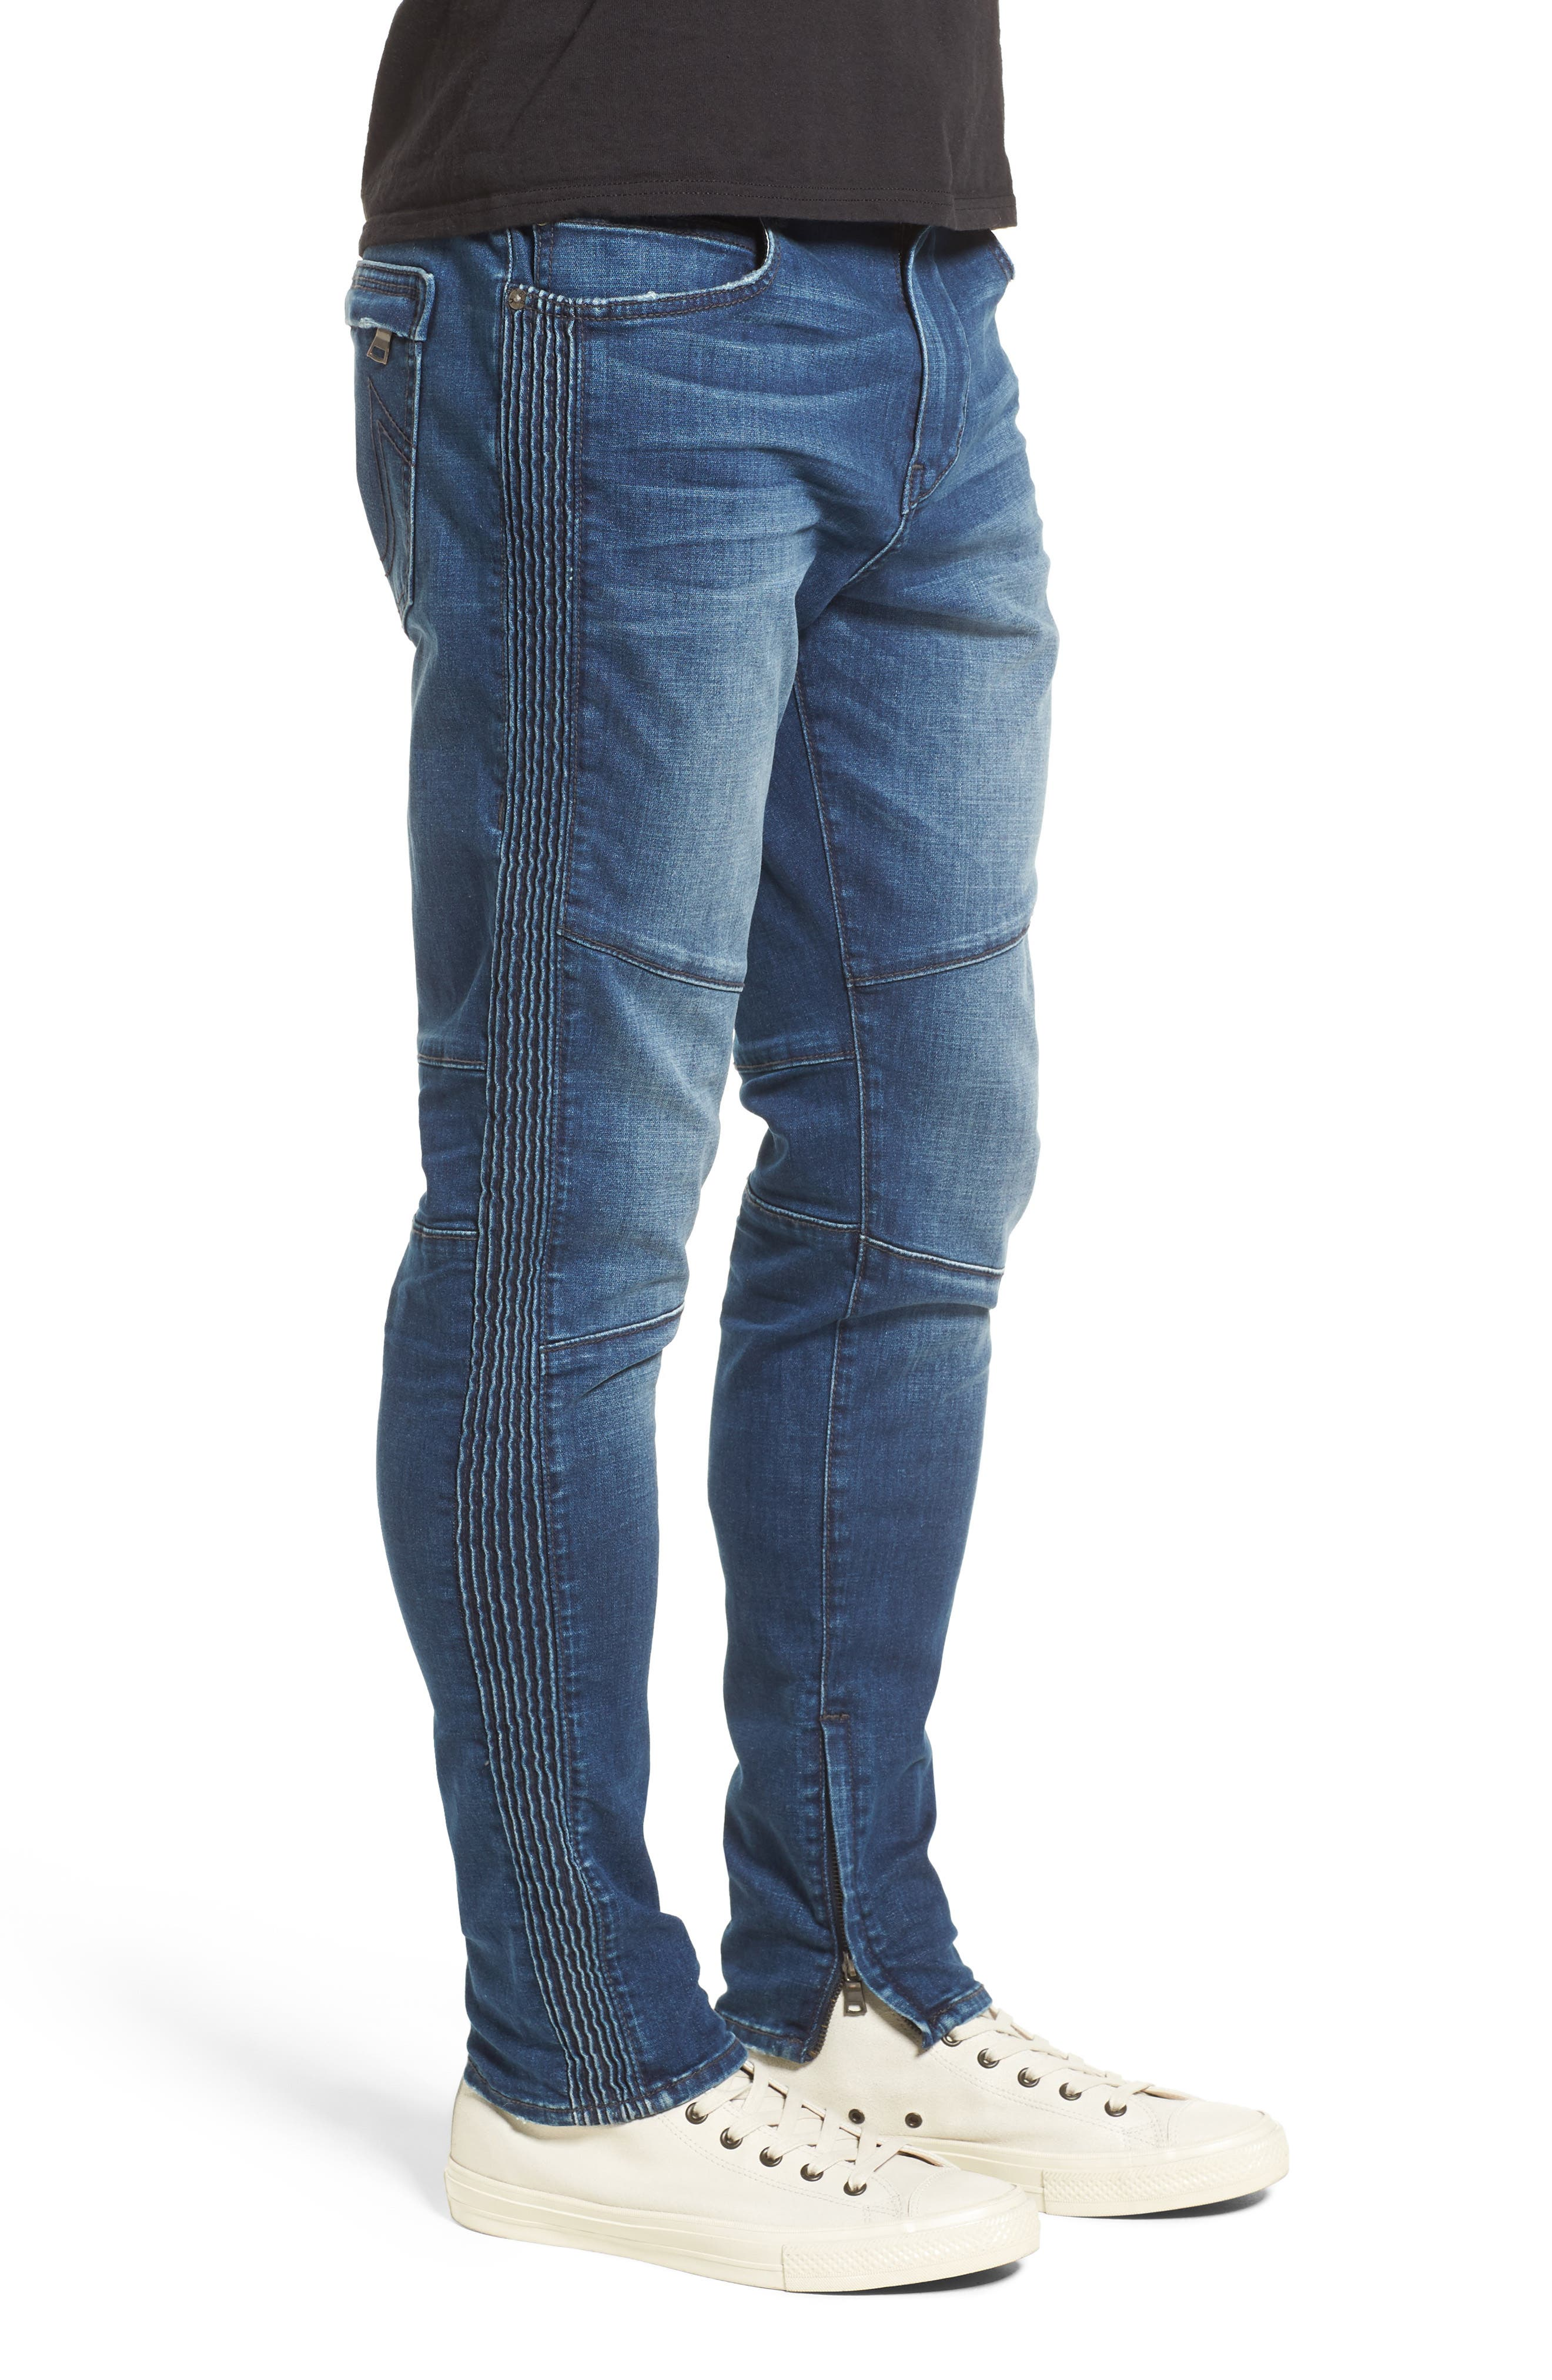 Racer Skinny Fit Jeans,                             Alternate thumbnail 3, color,                             WHISKEY BLUES